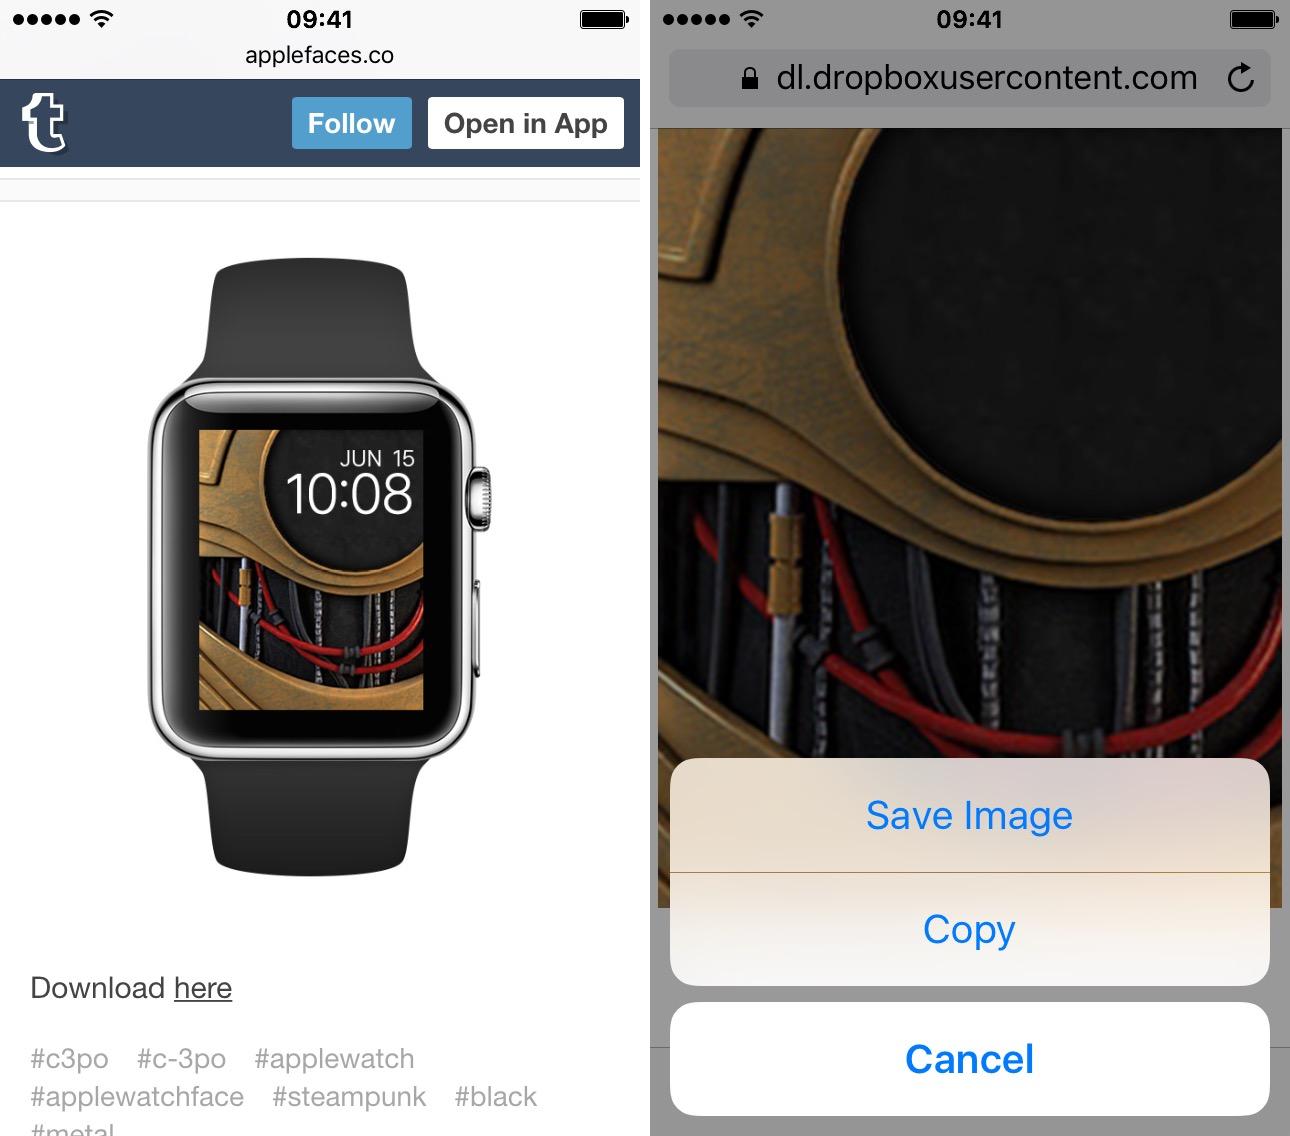 apple watch custom wallpaper  Apple Faces: a website for Apple Watch wallpapers